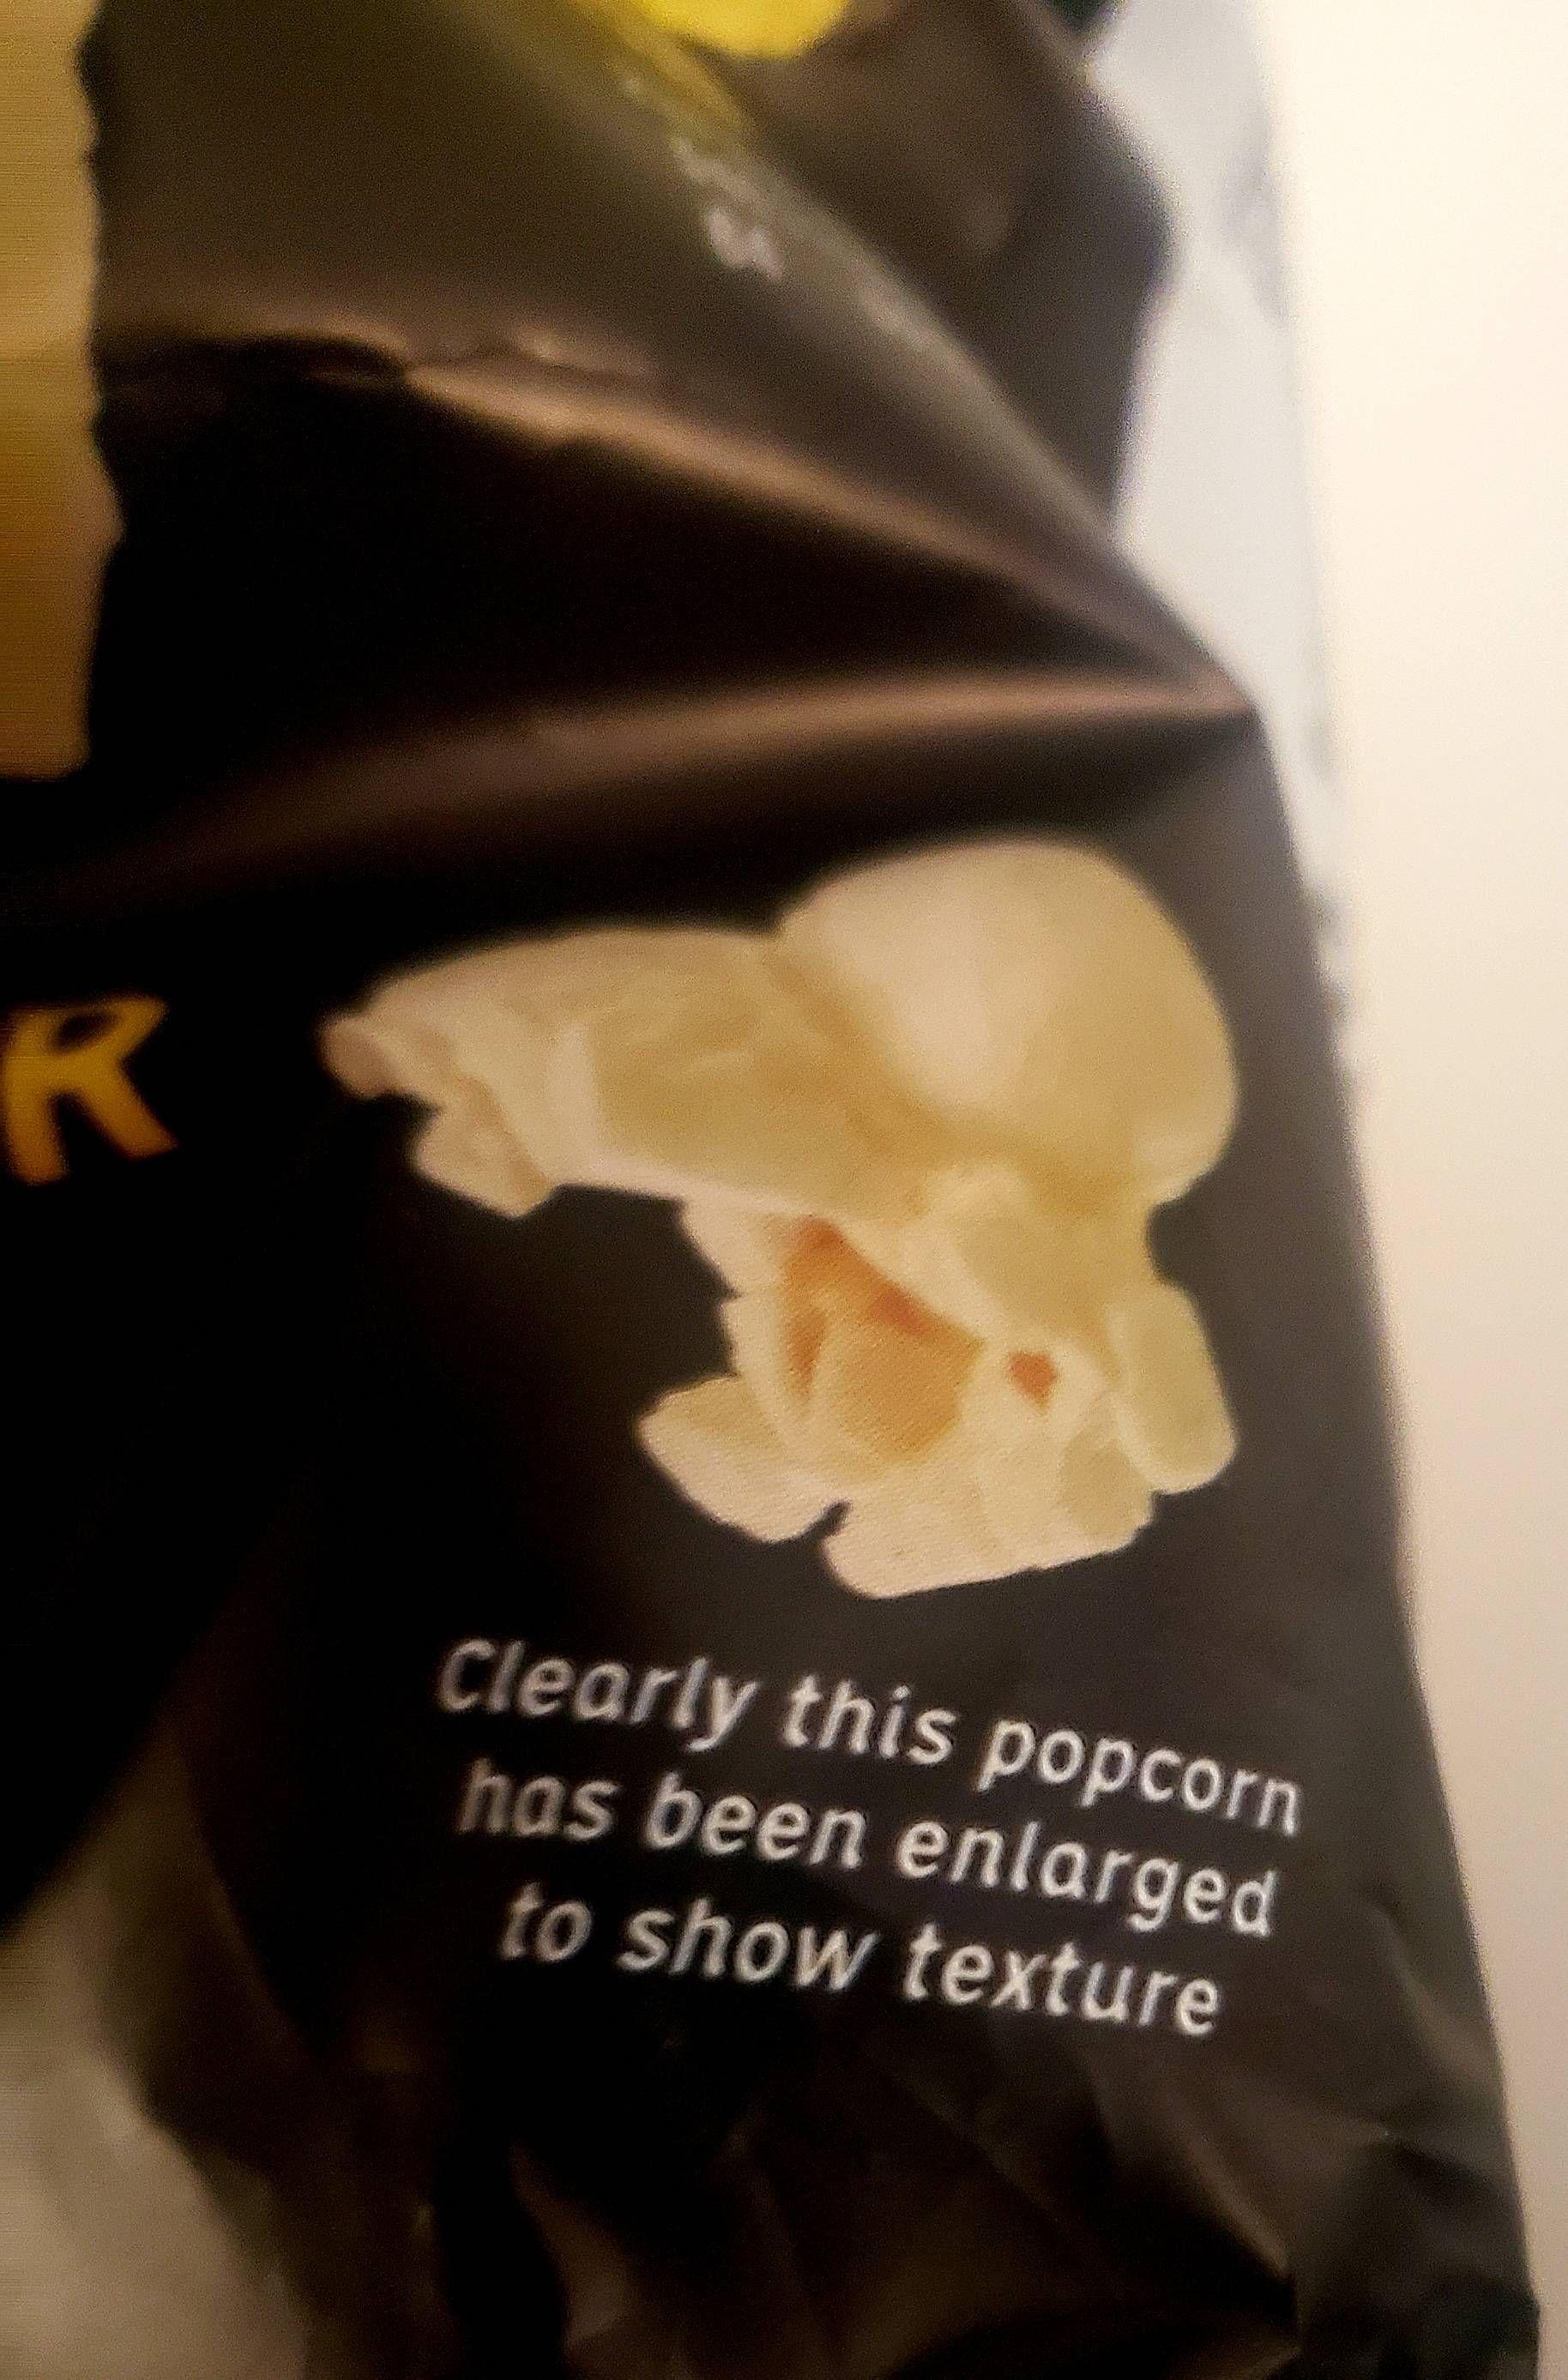 My popcorn bag thinks I'm a moron.